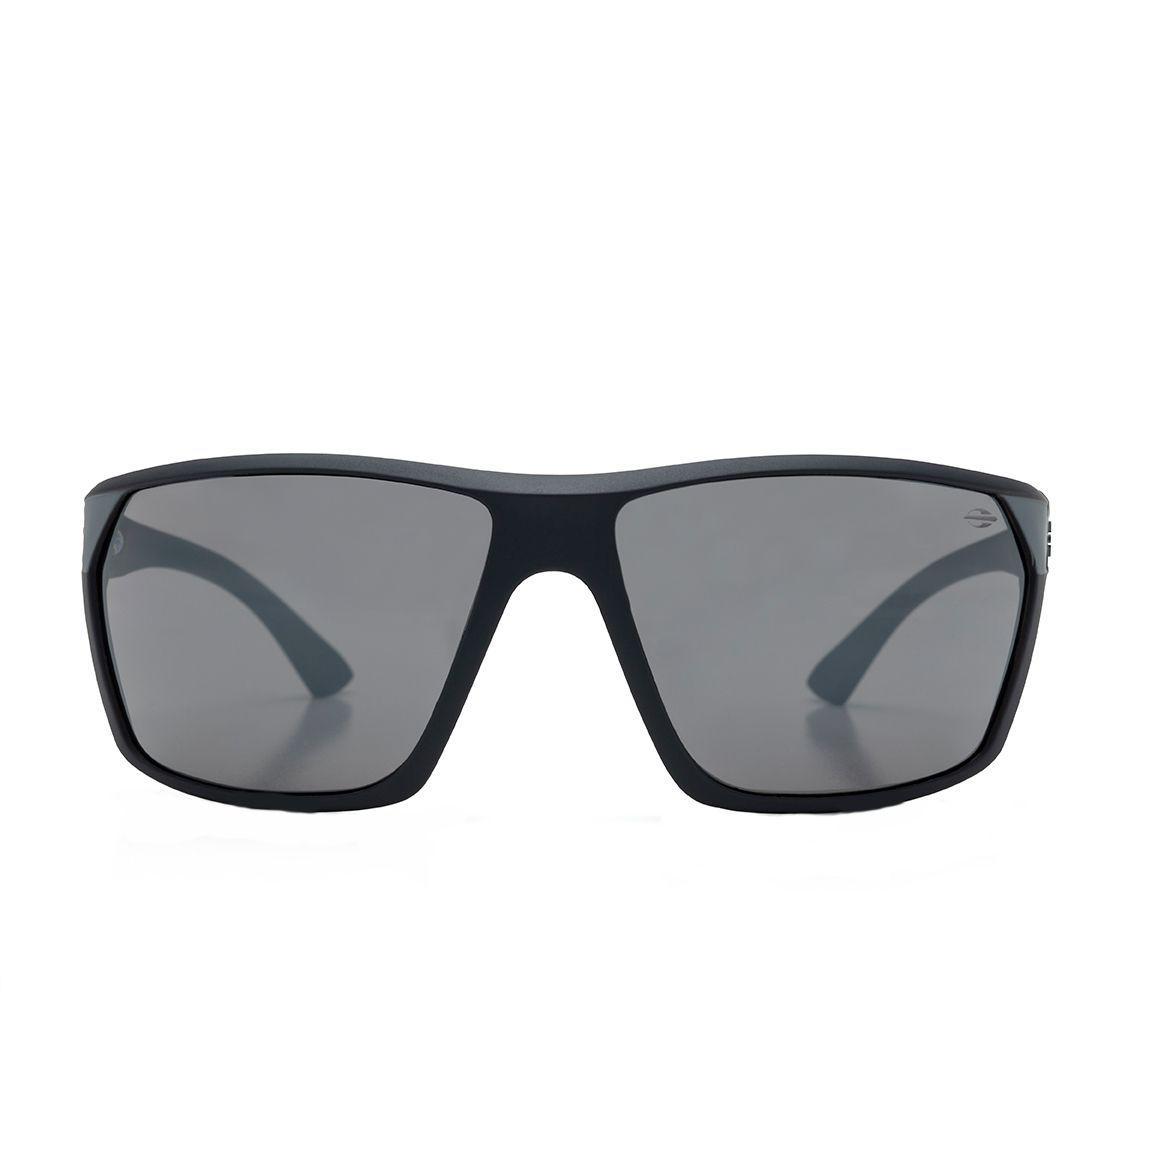 Óculos de Sol Mormaii Storm Masculino M0079DF509 - Acetato Cinza Fosco R   320,00 à vista. Adicionar à sacola 7217748095